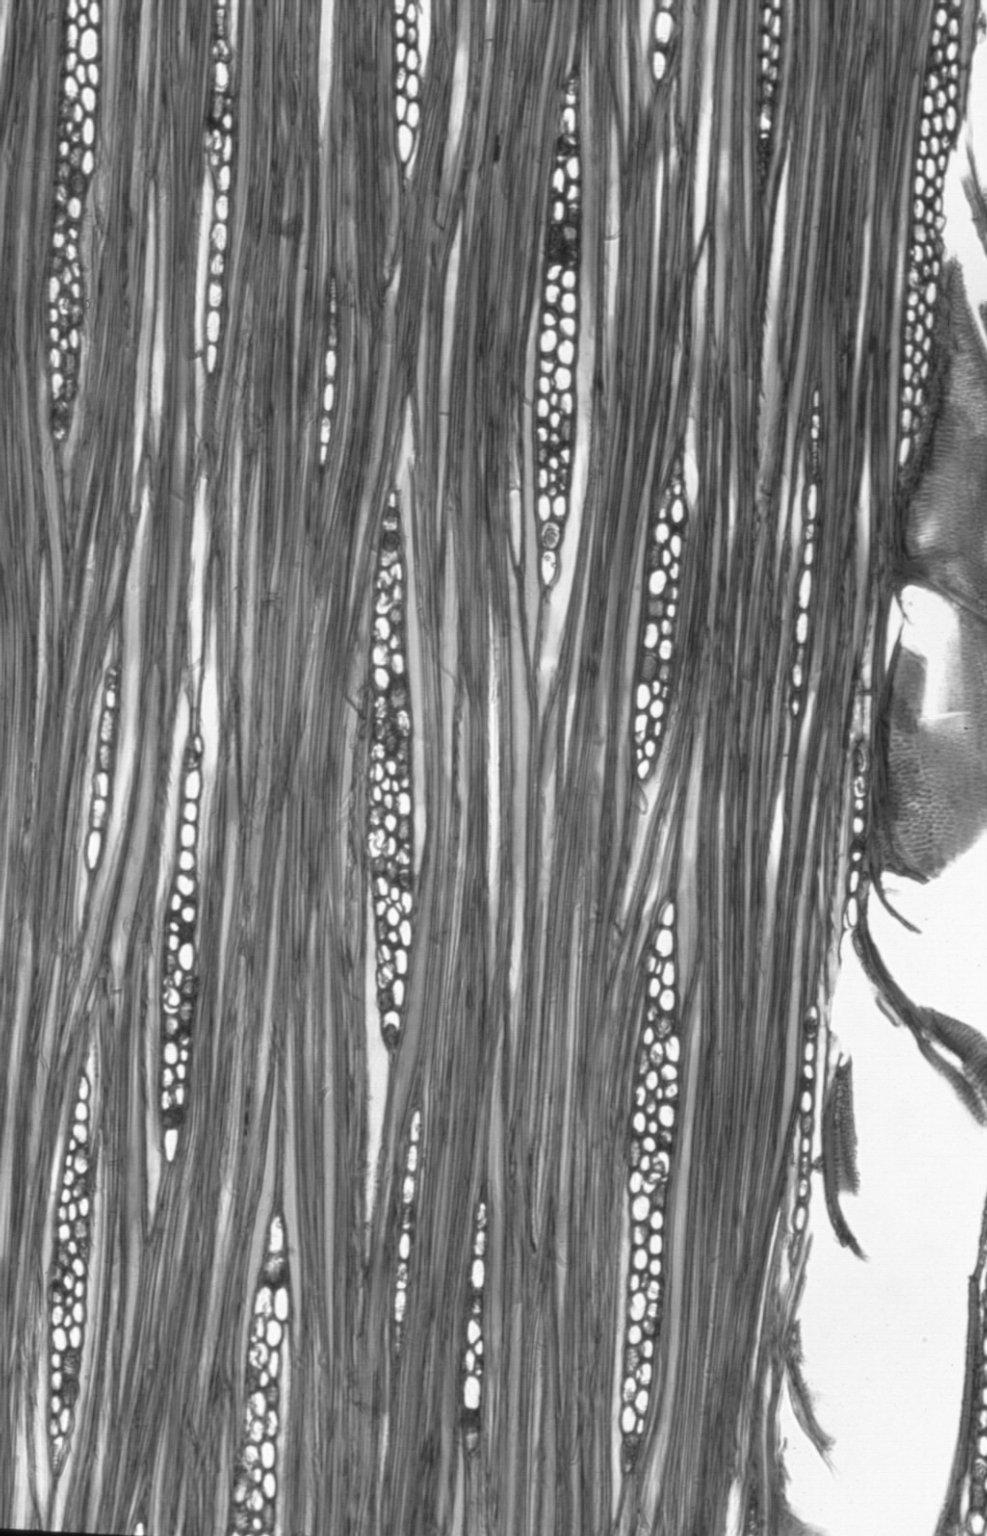 LEGUMINOSAE CAESALPINIOIDEAE Gossweilerodendron balsamiferum